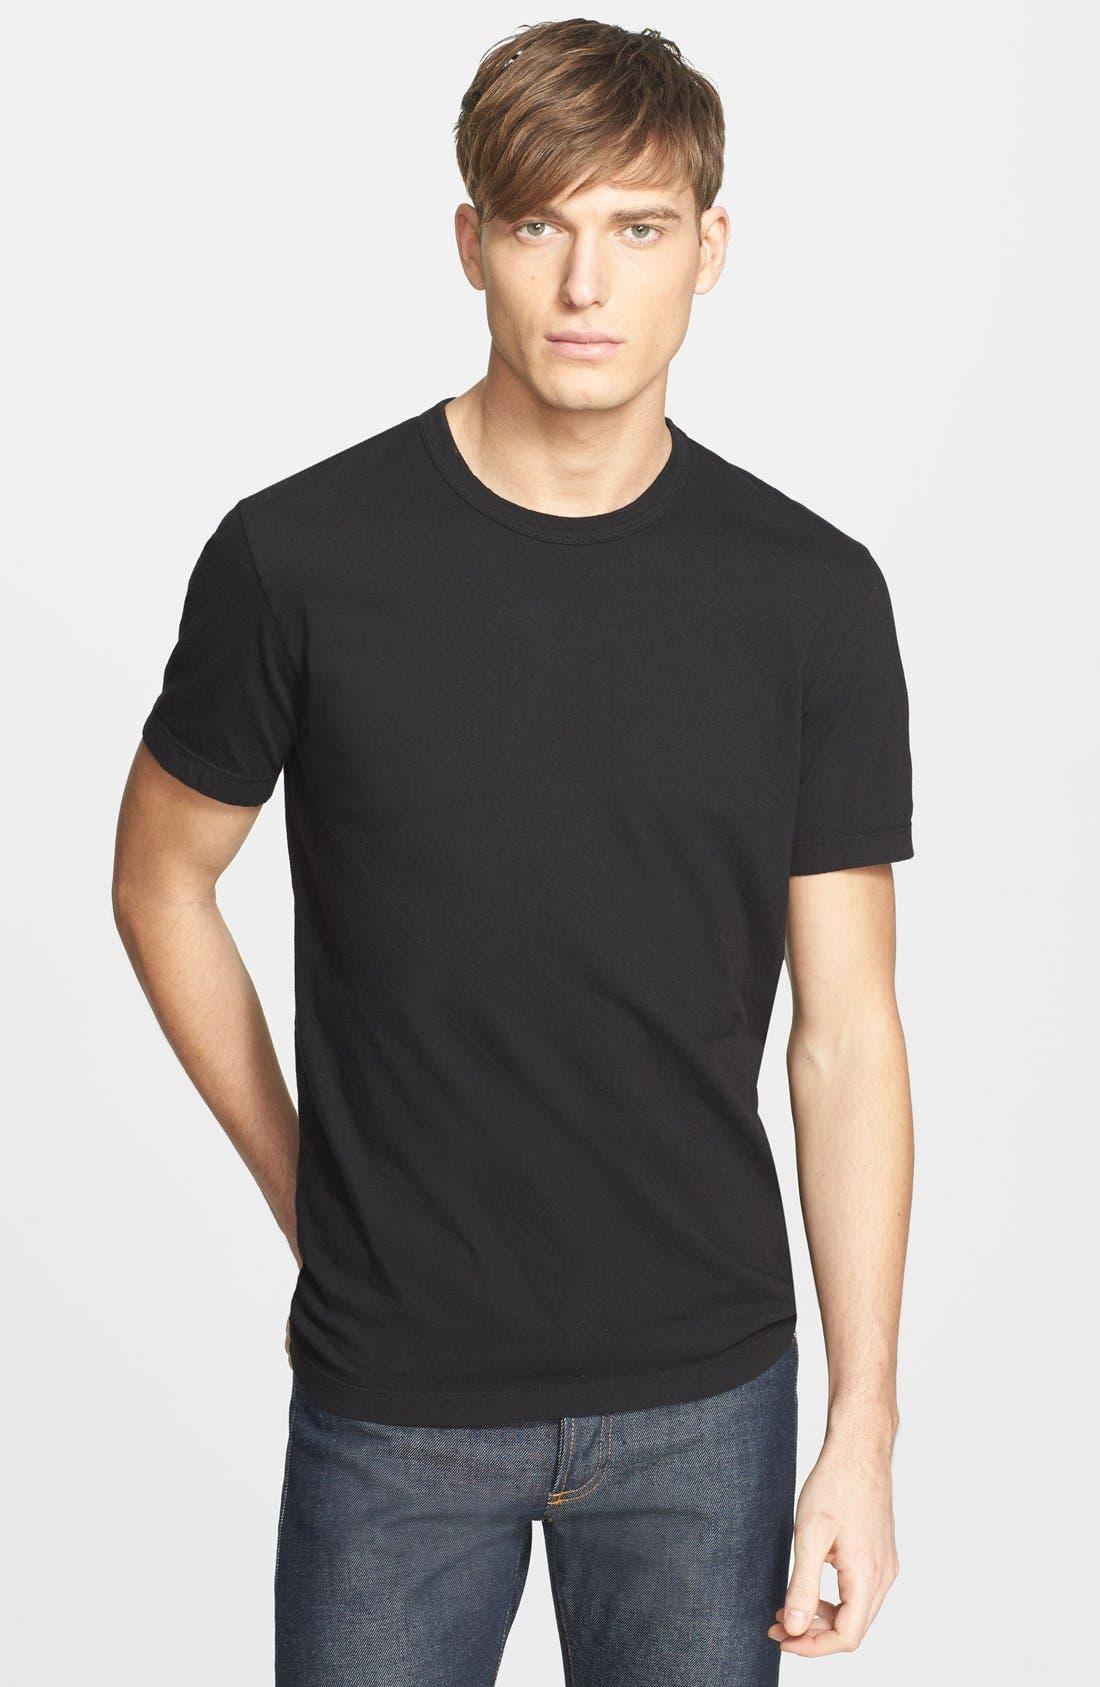 67d7d4ac Men's T-Shirts, Tank Tops, & Graphic Tees   Nordstrom